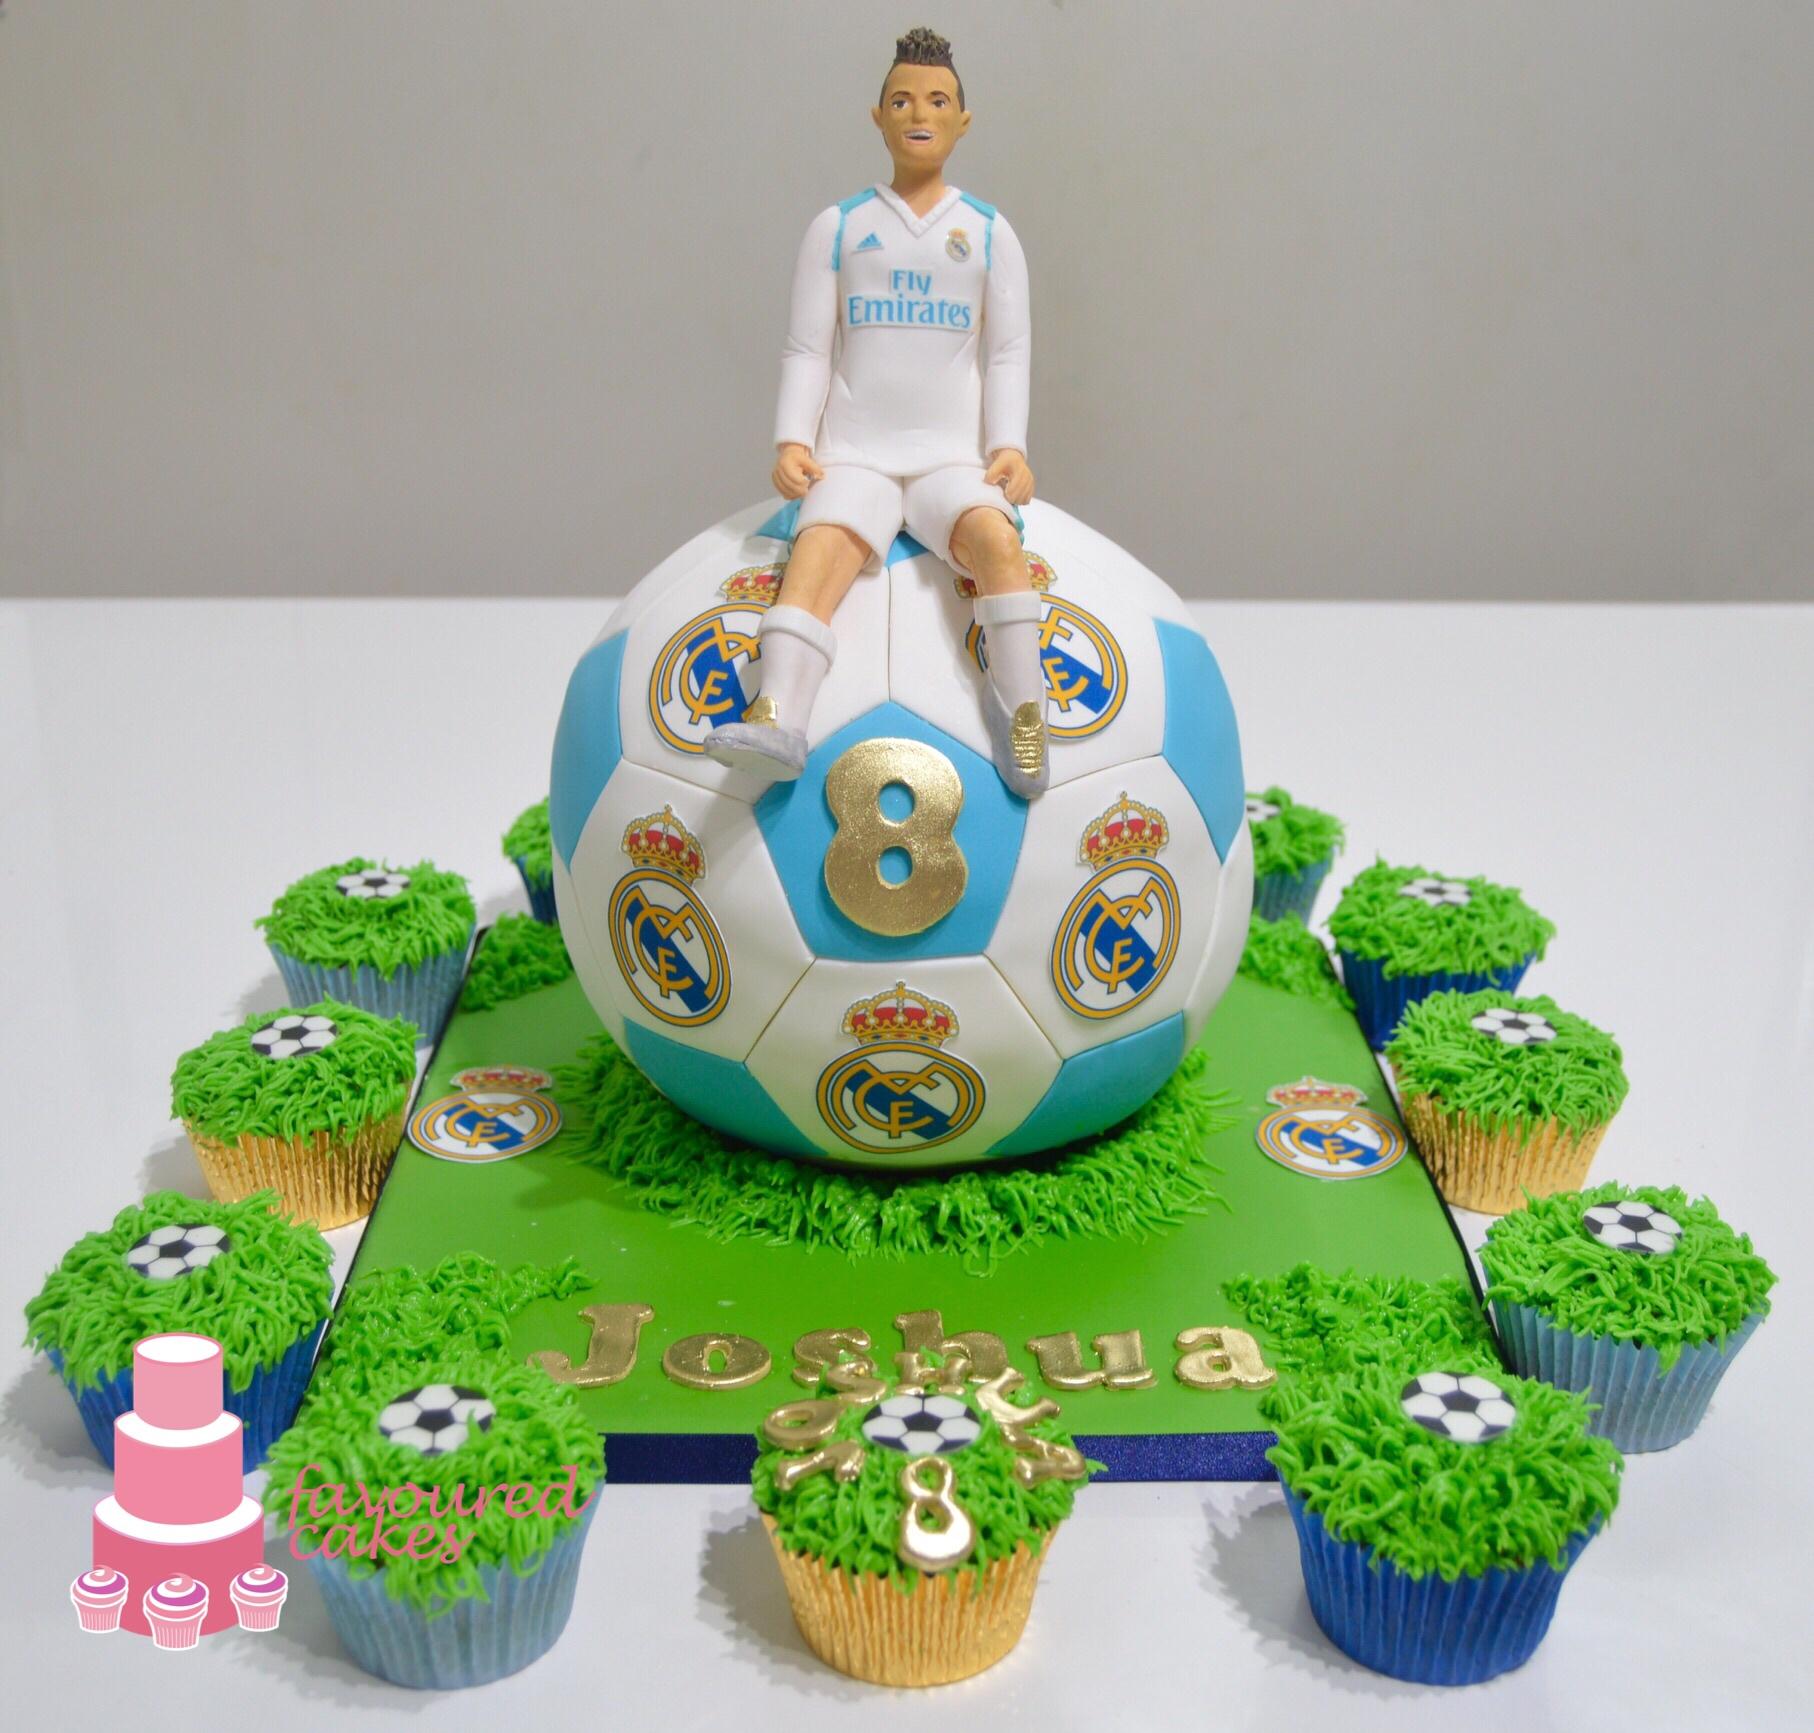 Real Madrid Ronaldo Football Cake